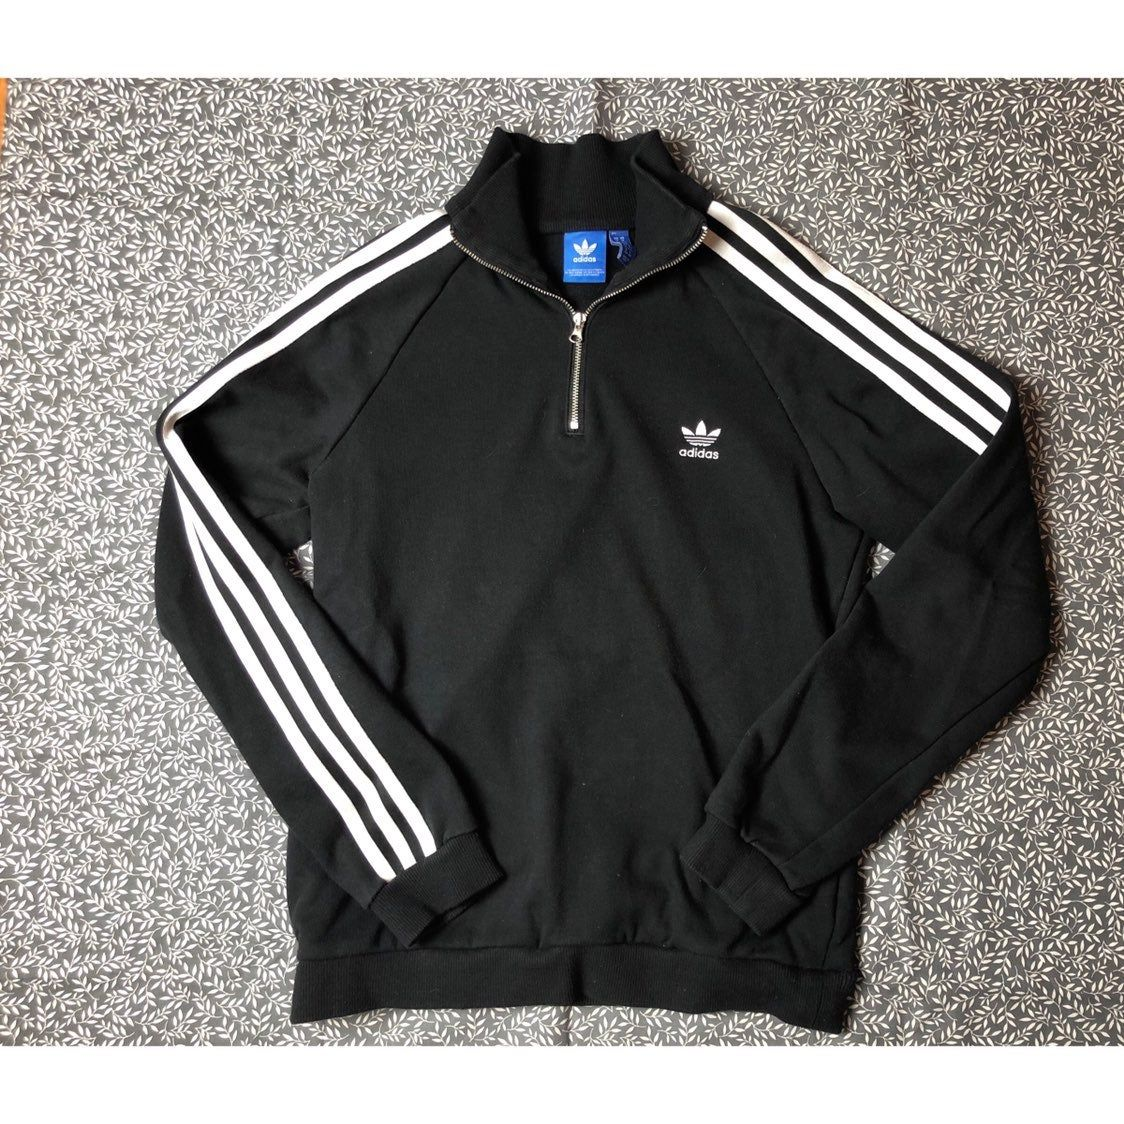 Adidas Sweatshirt Size Medium On Mercari Adidas Sweatshirt Adidas Jacket Fashion [ 1124 x 1124 Pixel ]